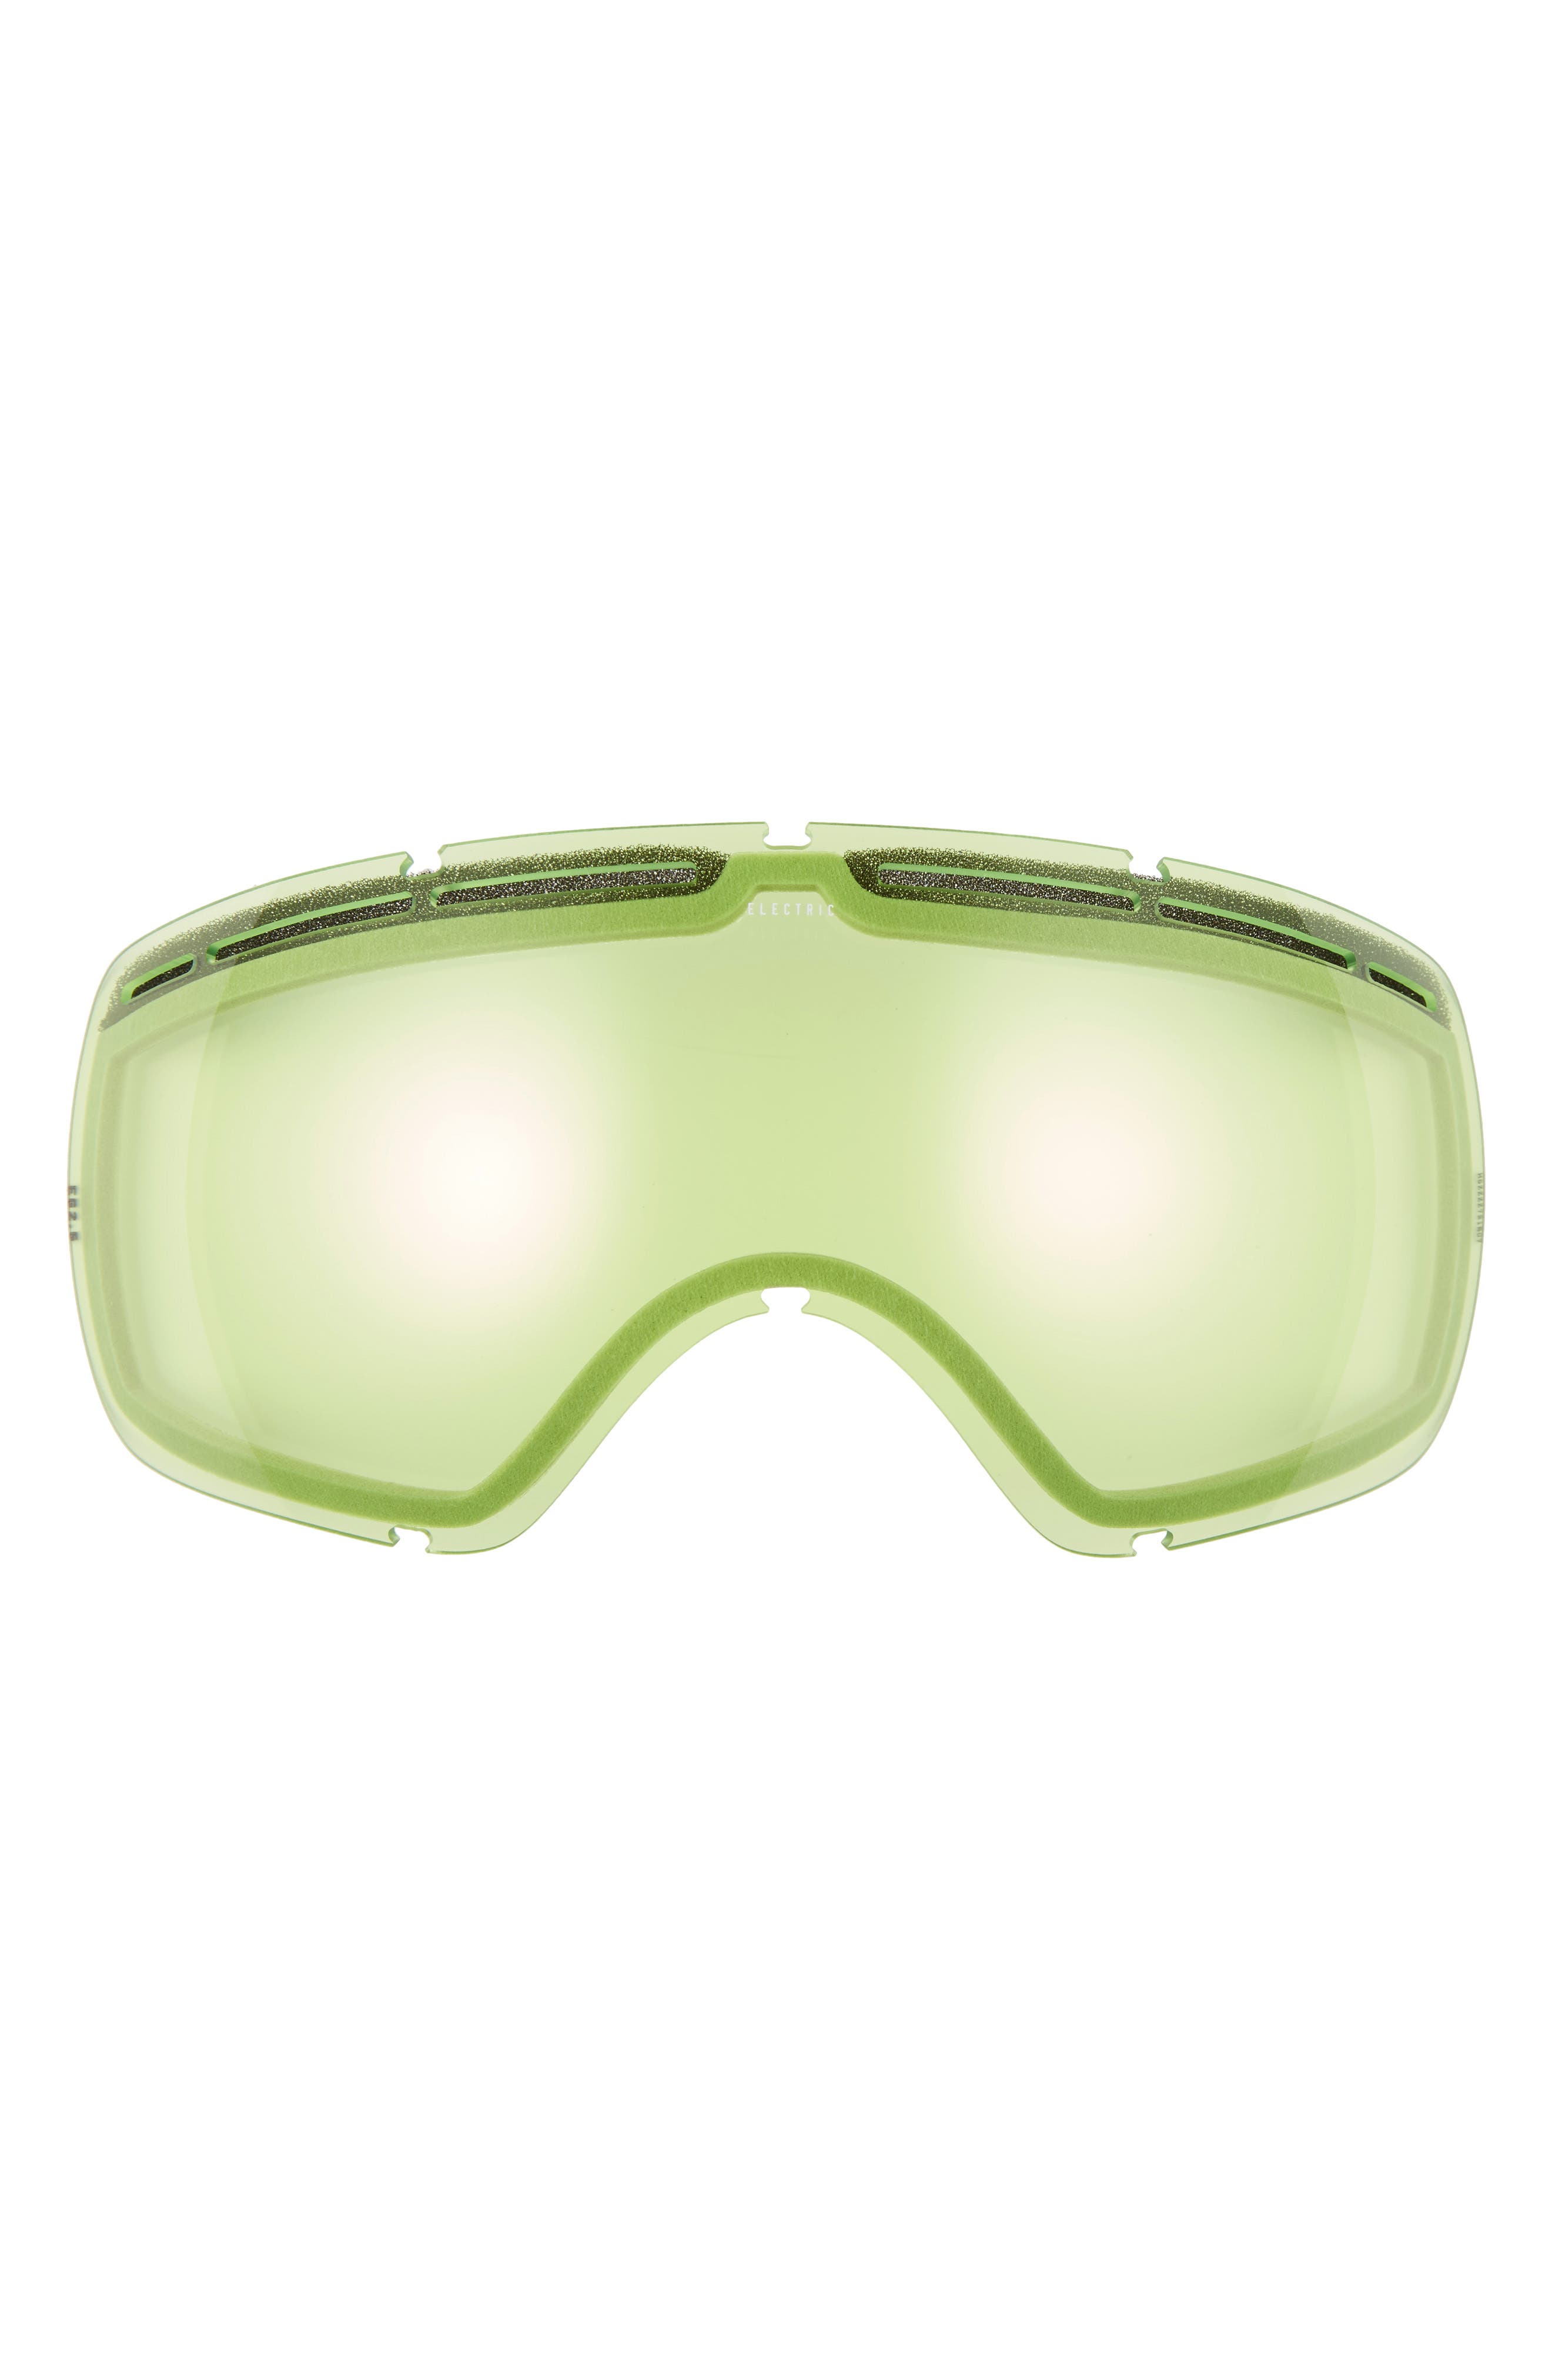 EG 2.5 215mm Snow Goggles,                             Alternate thumbnail 21, color,